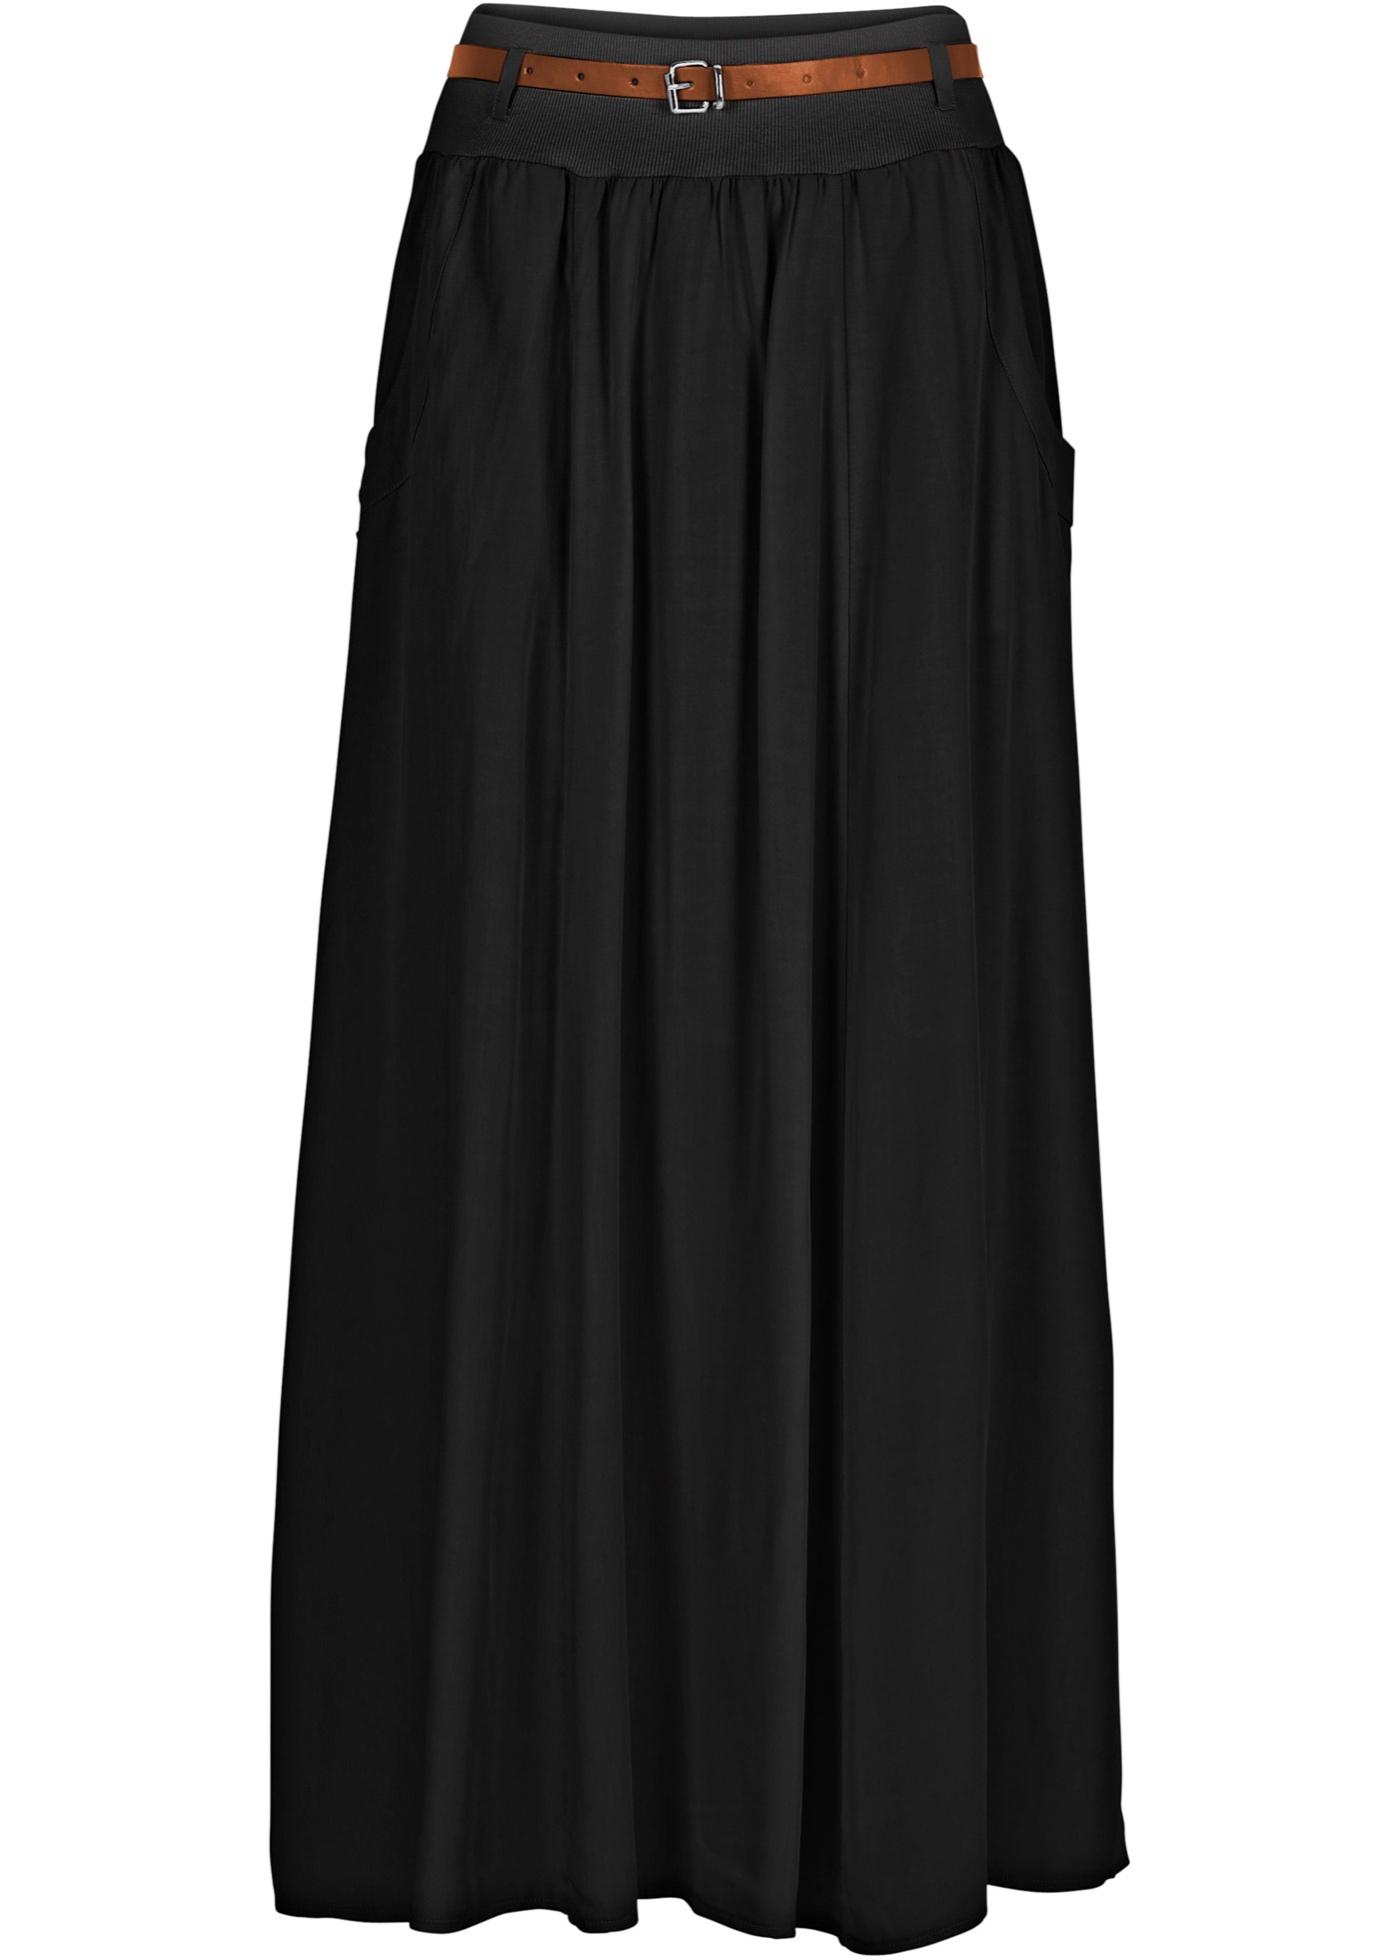 Jupe noir femme - bonprix